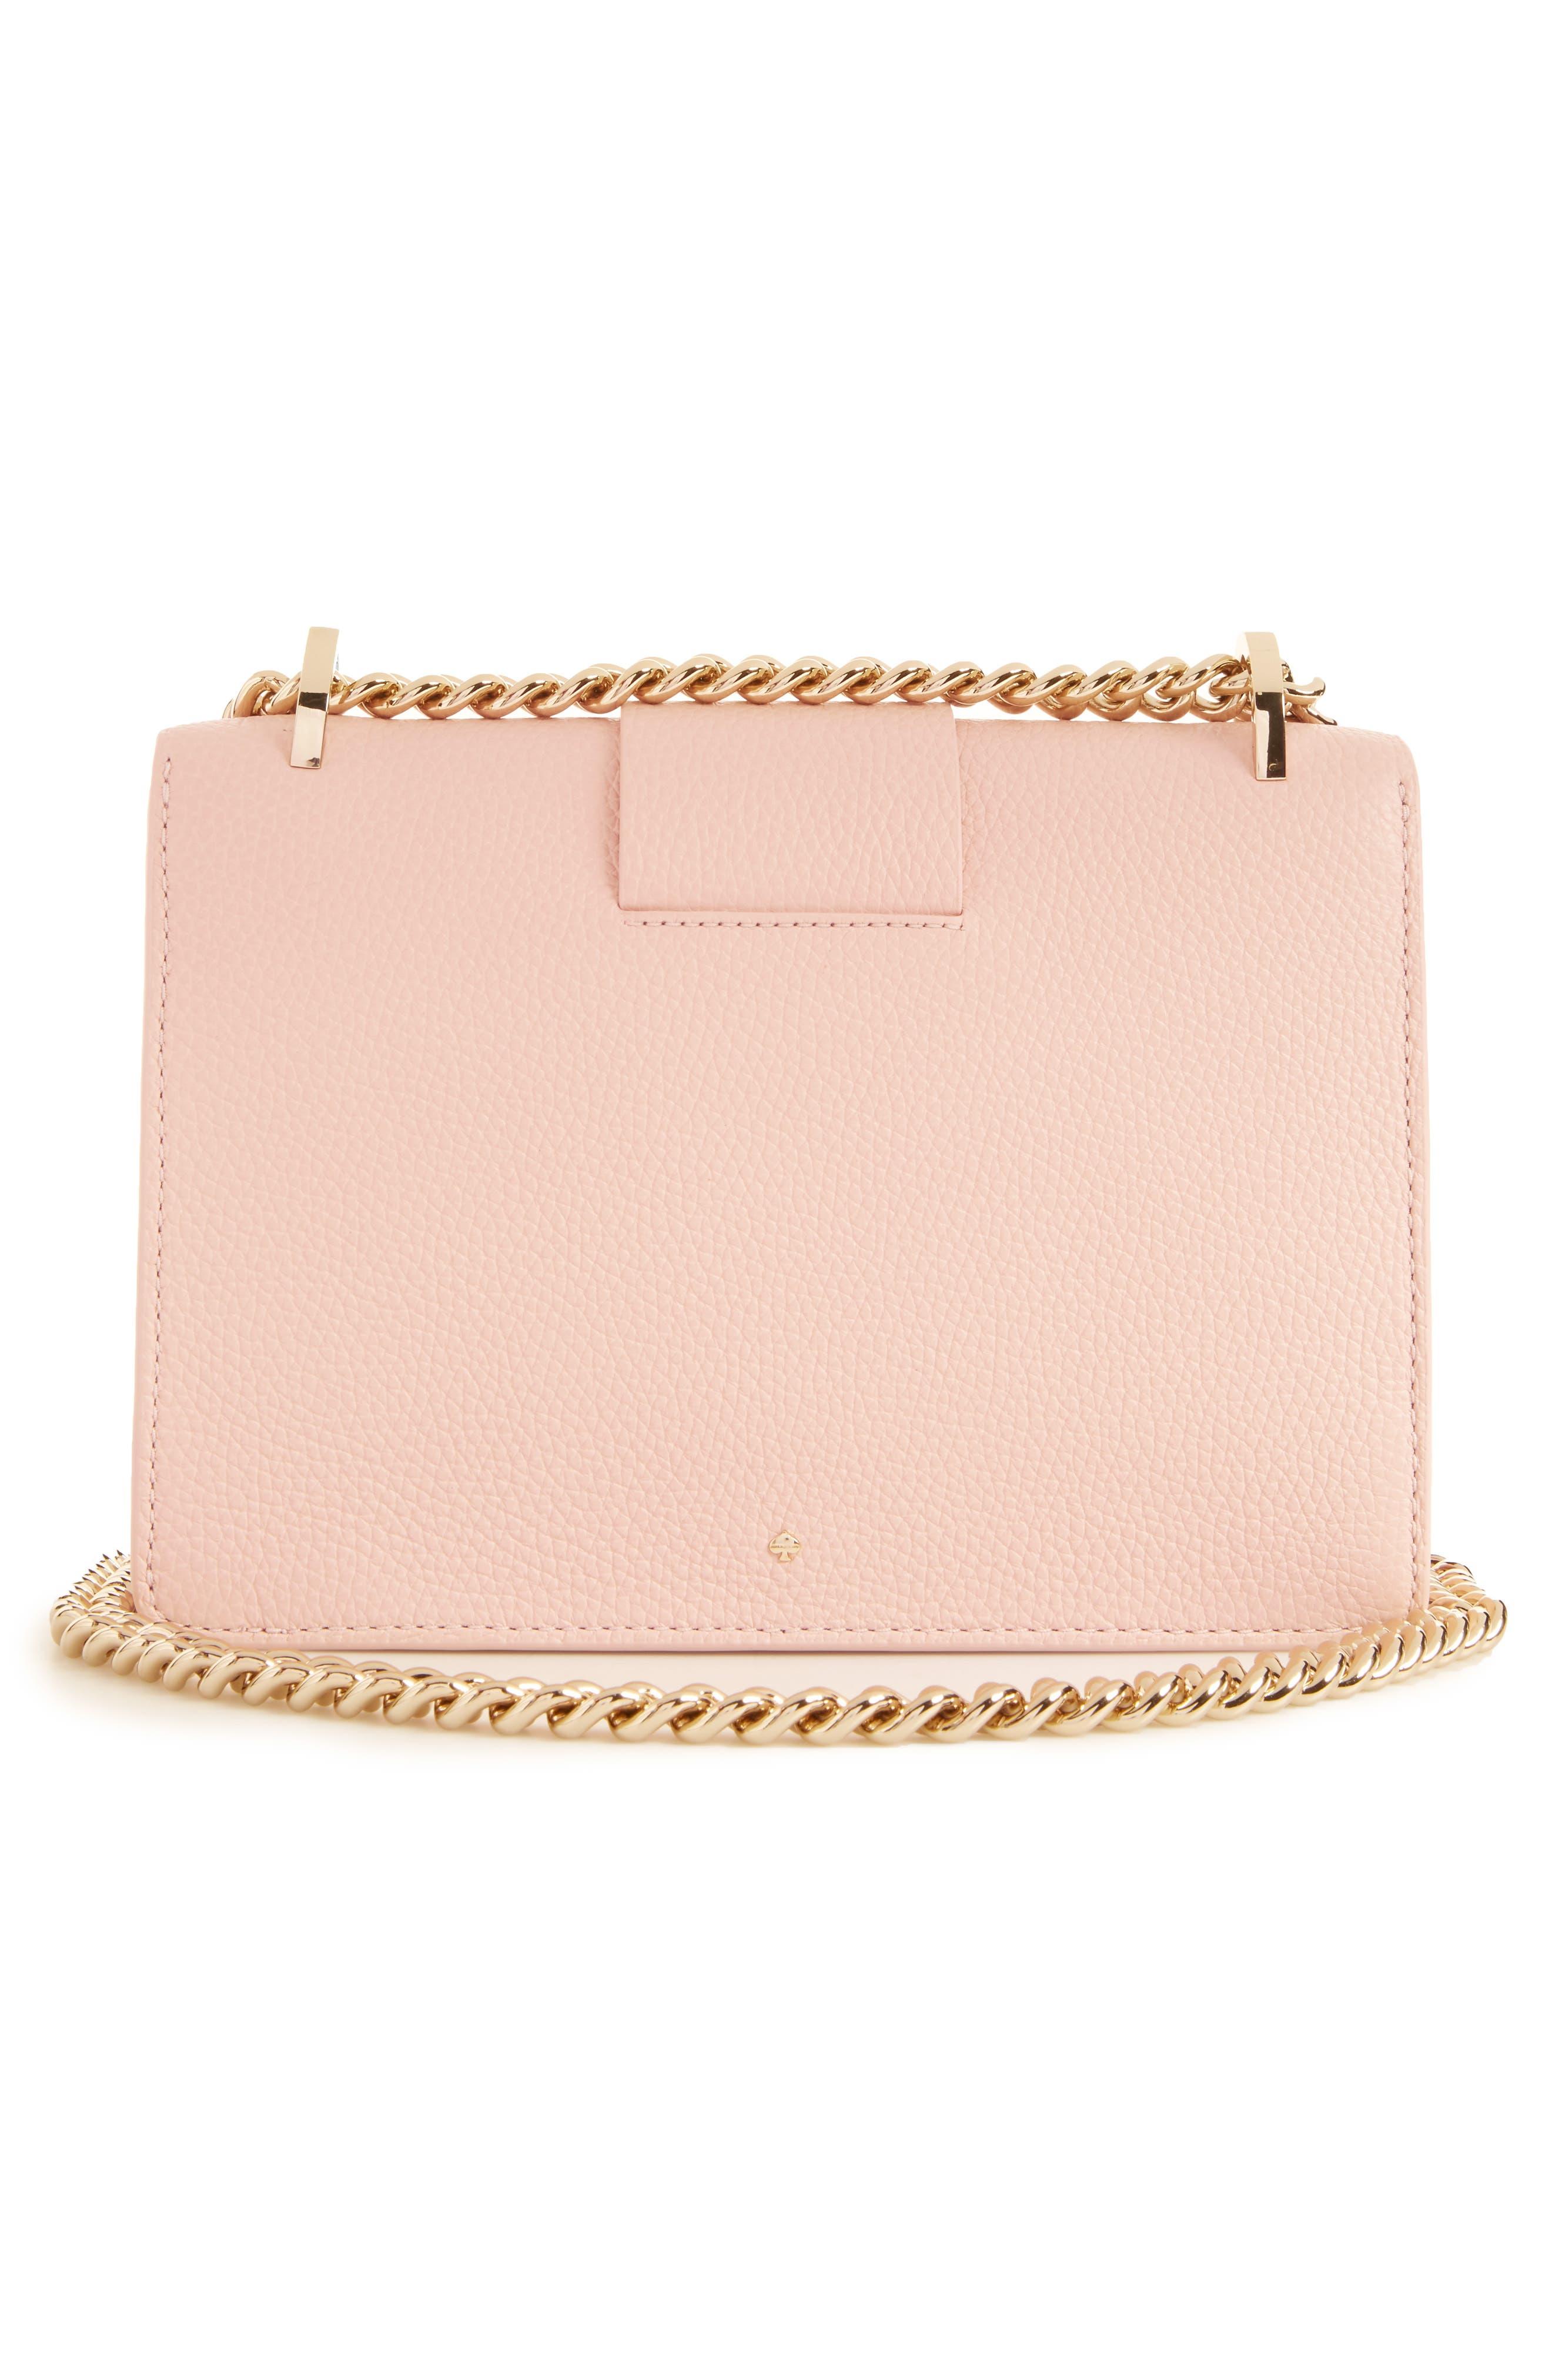 madison knollwood drive - buckle marci leather shoulder bag,                             Alternate thumbnail 6, color,